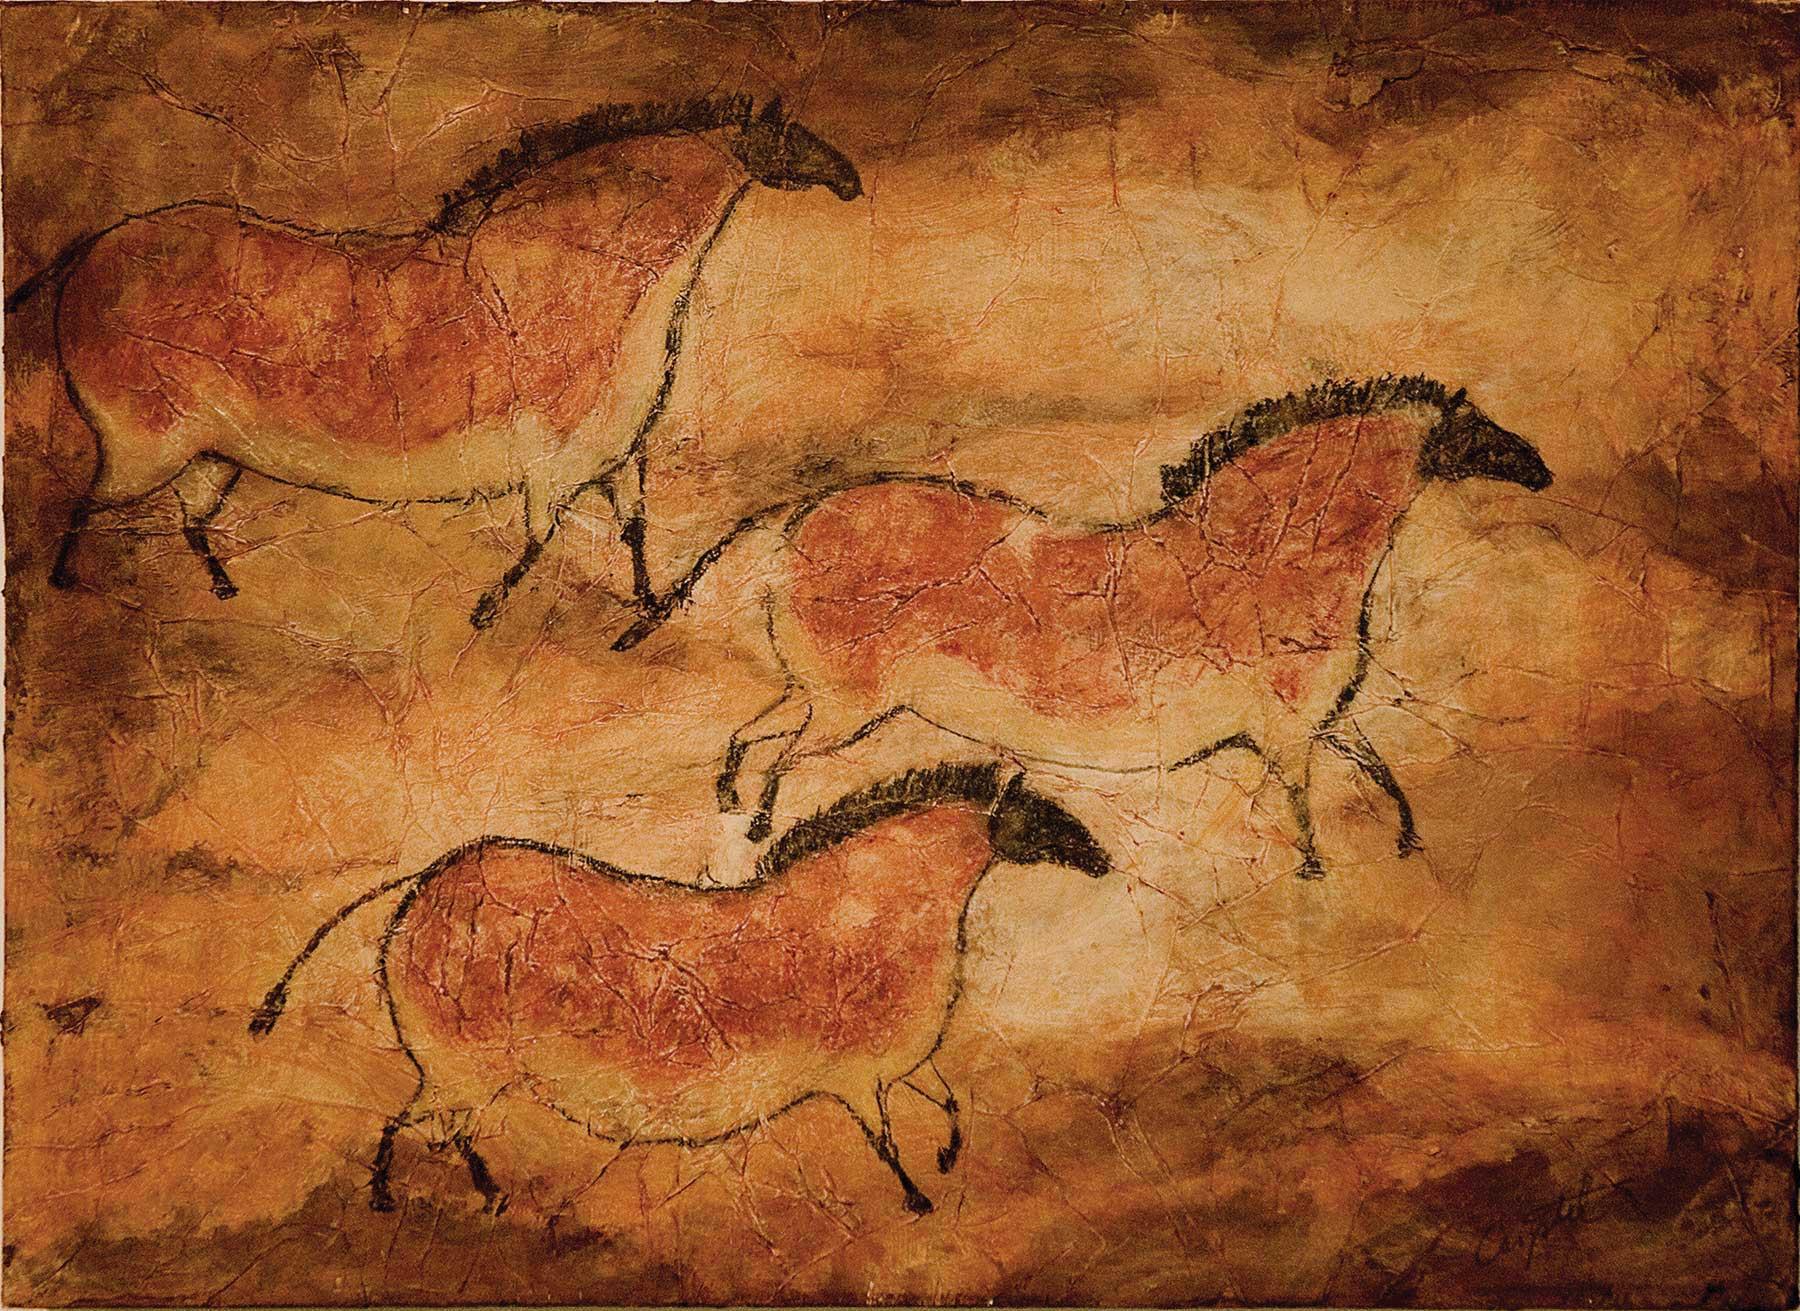 Spirit-Horse-Gallery-1-Brochure-Image-6-x-4-cave-treio.jpg